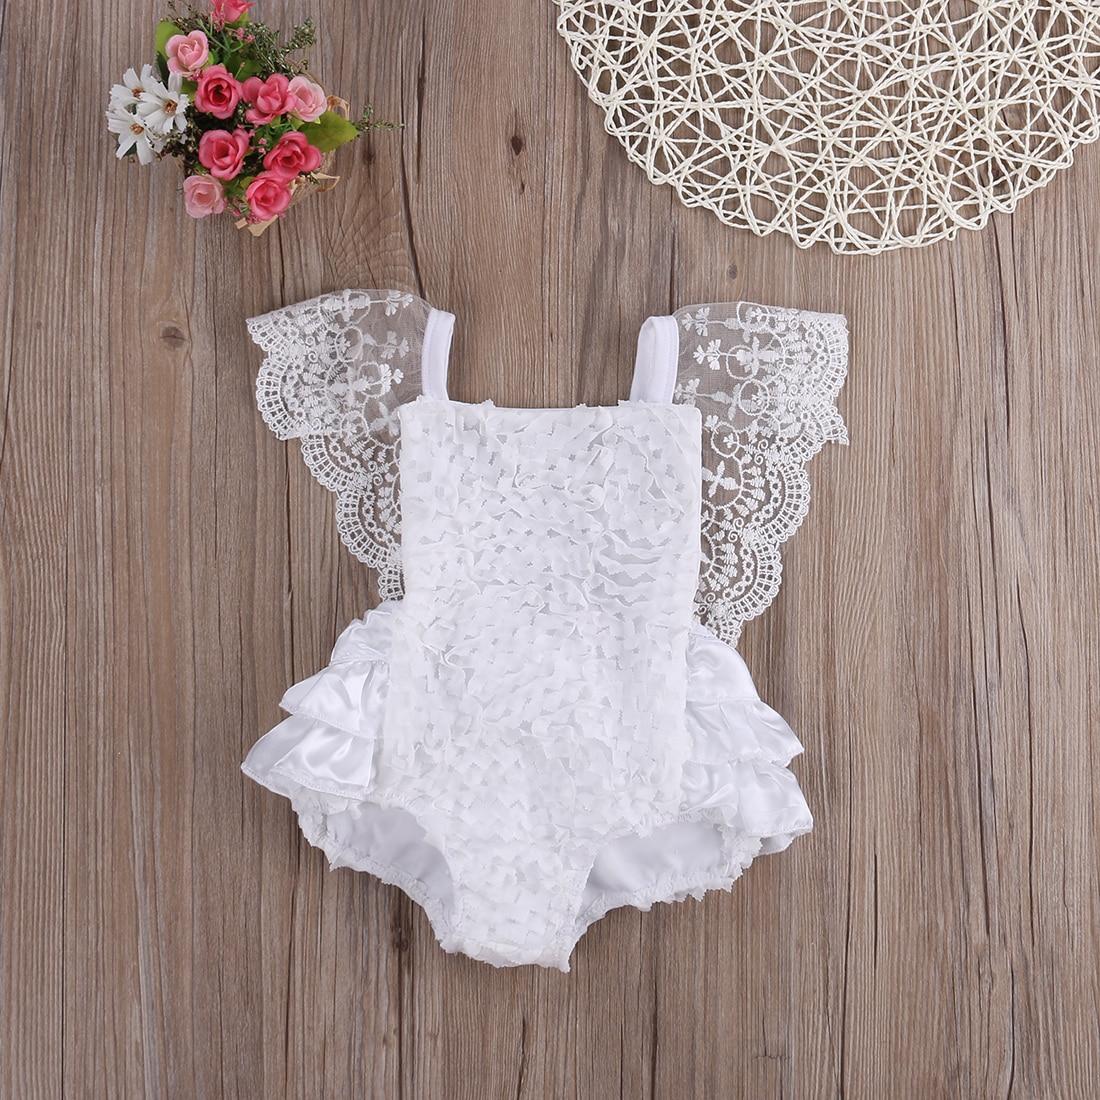 bad4a53033e0 2018 Multitrust Brand Cute Newborn Infant Baby Girl Clothes Lace Tutu Romper  Sleeveless Cake Sunsuit White